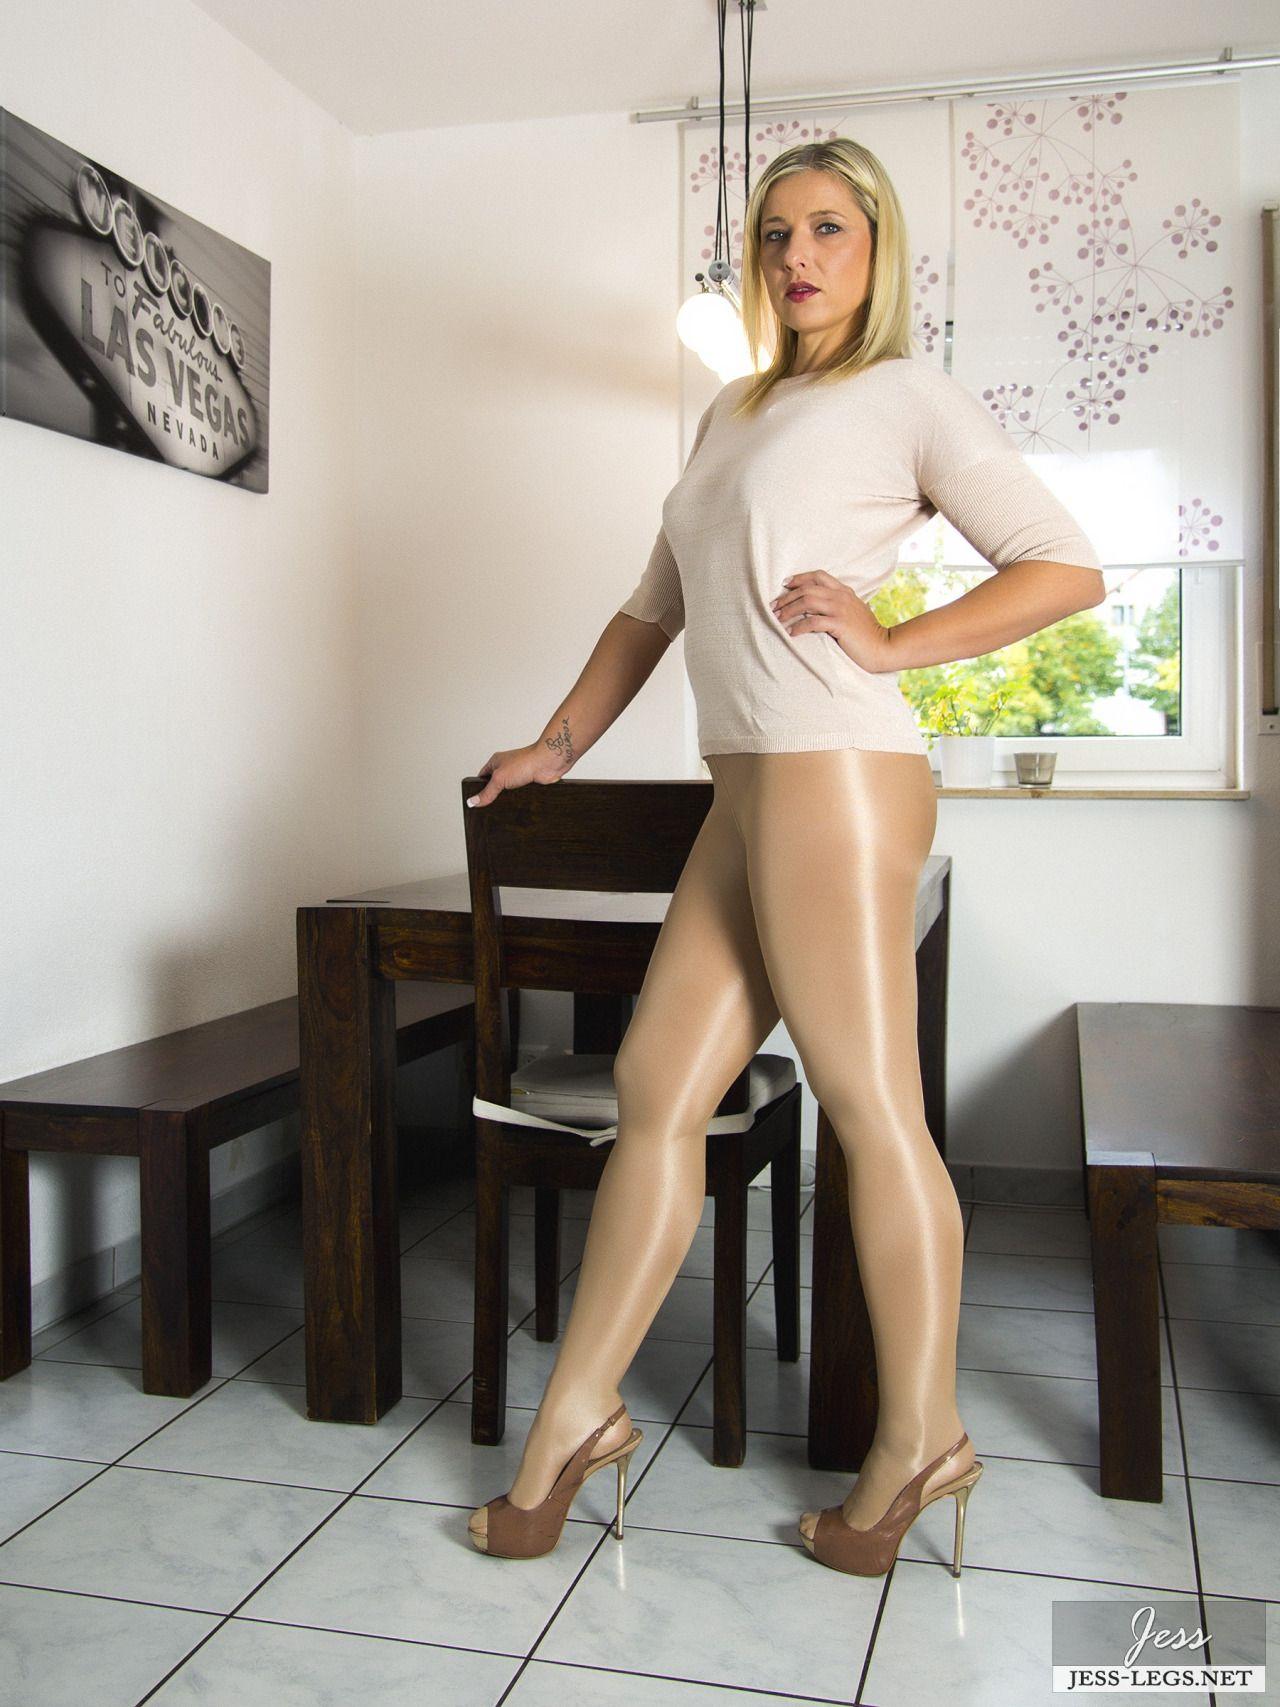 Sexy Pornstar Andi Roxxx Up Close And Personal